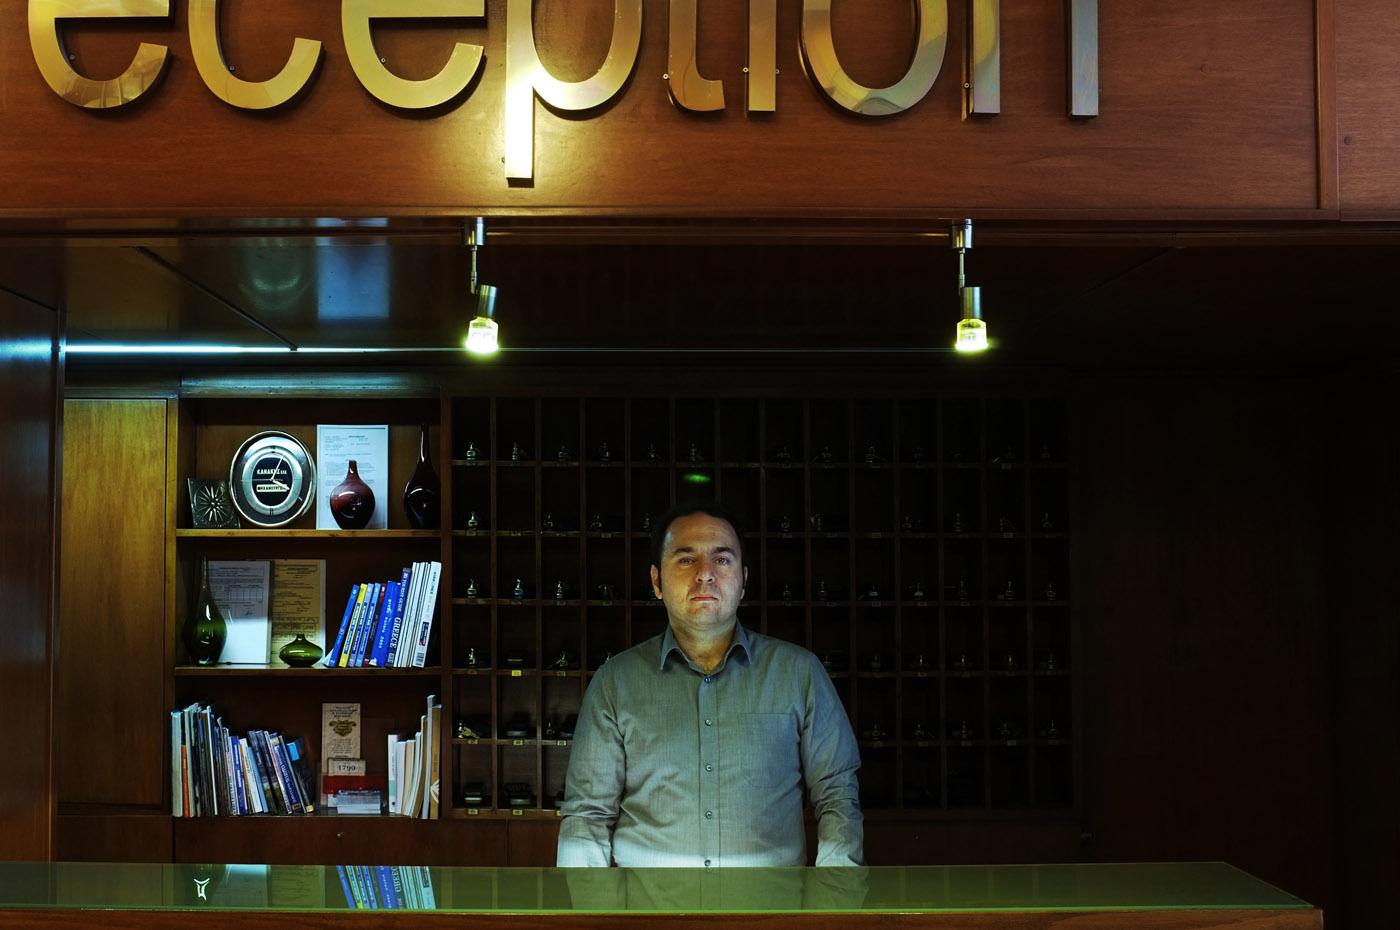 John Sigma_Greece_HotelEuropa_04.jpg.jpg